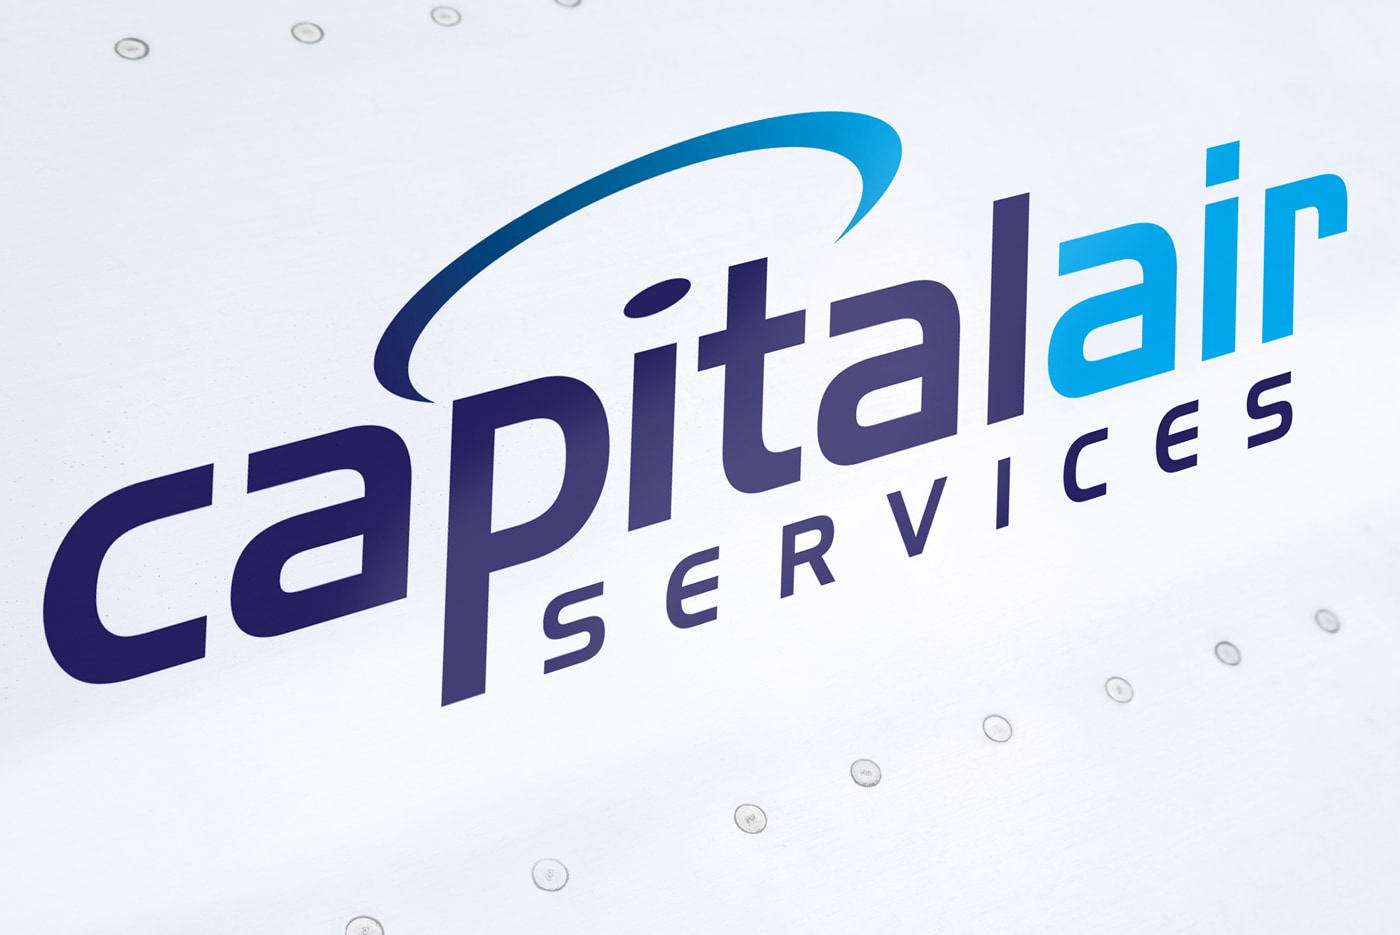 Capital Air Services